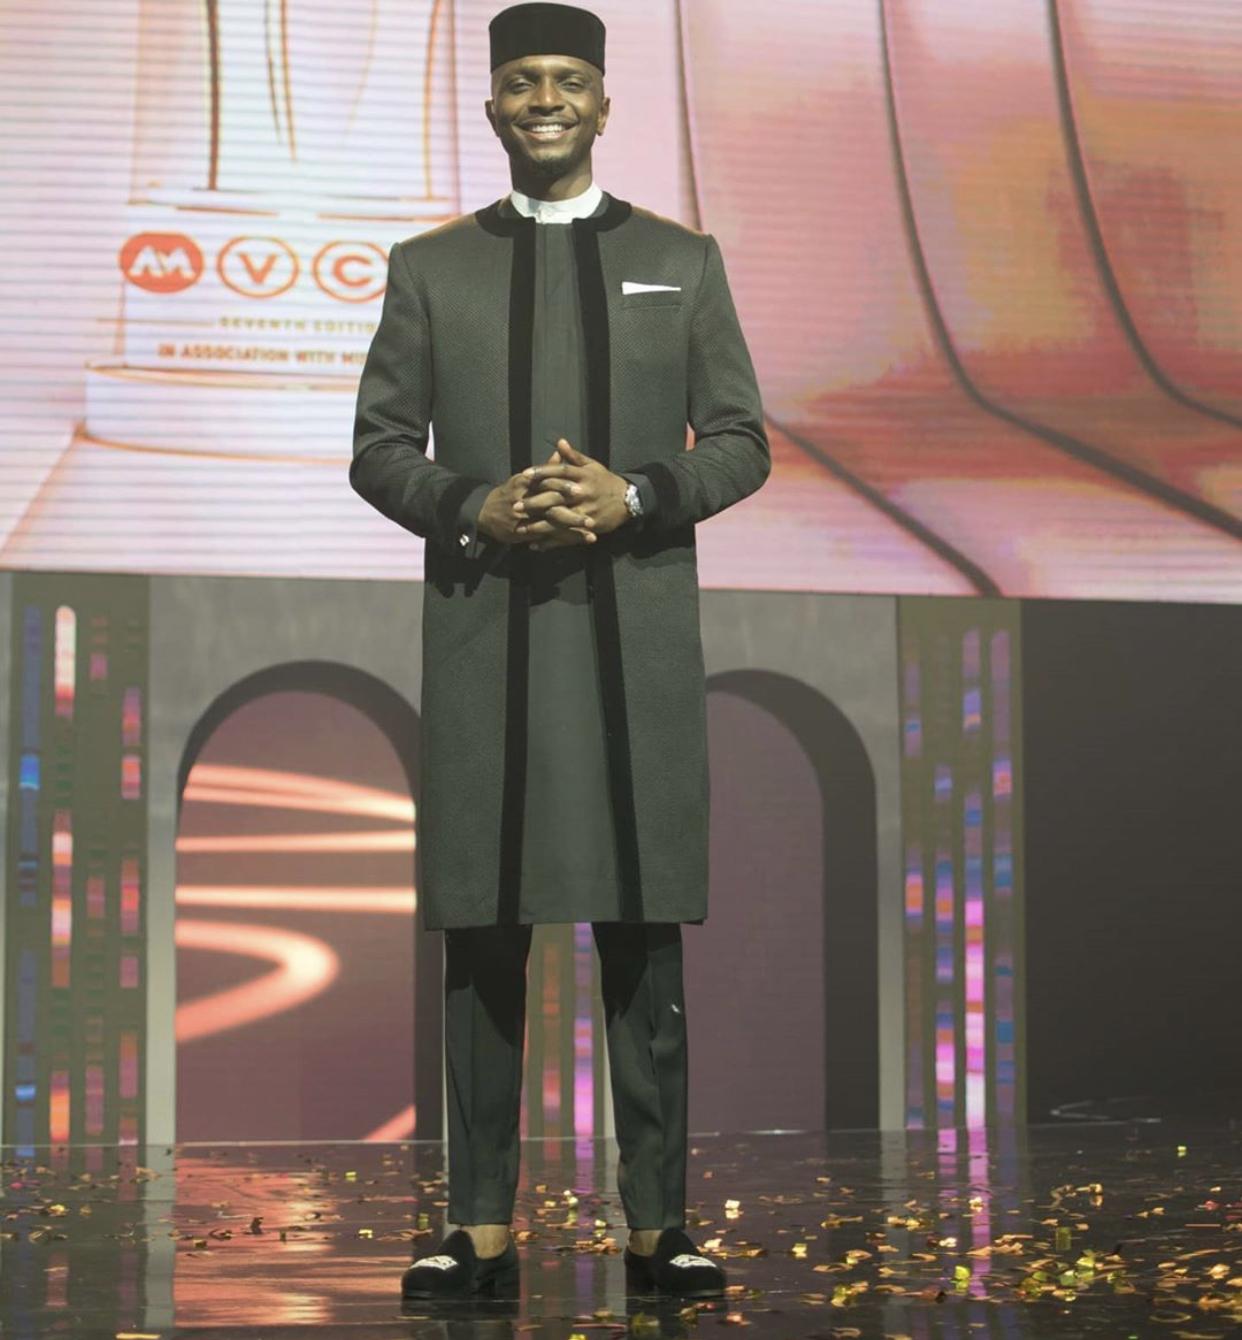 2020-amvcas-best-dressed-men-theravelist